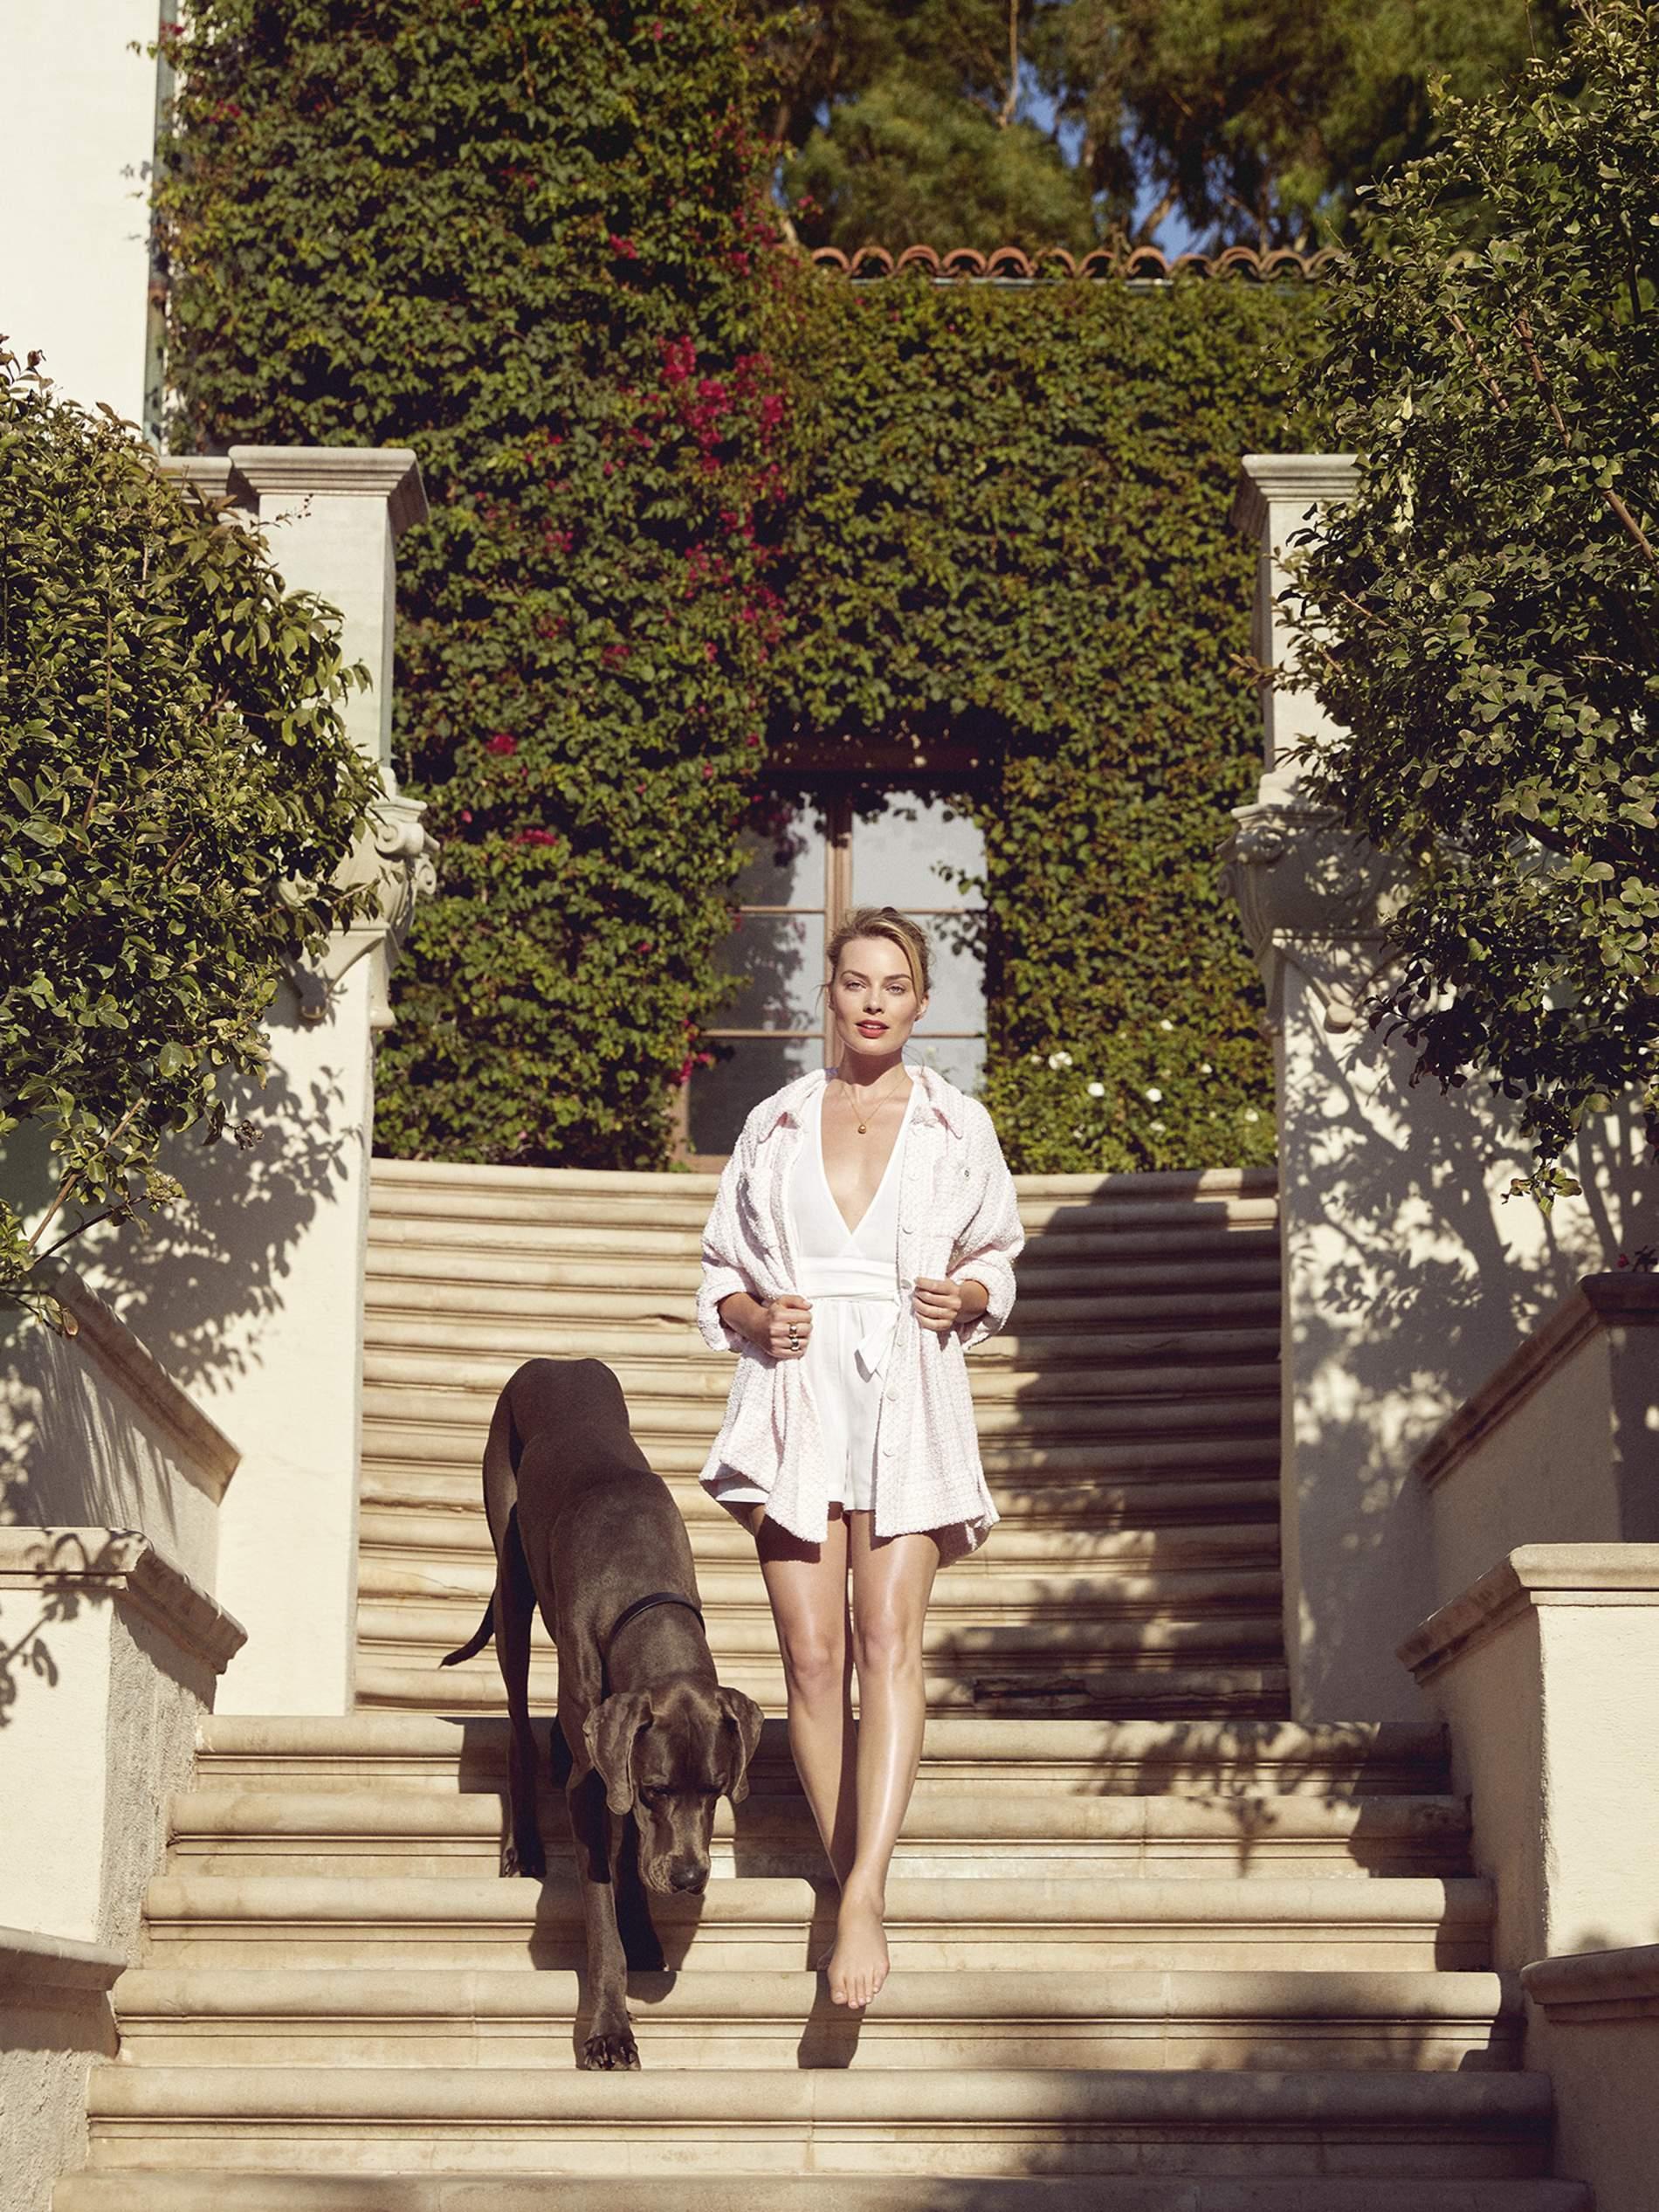 https://pics.wikifeet.com/Margot-Robbie-Feet-4954087.jpg